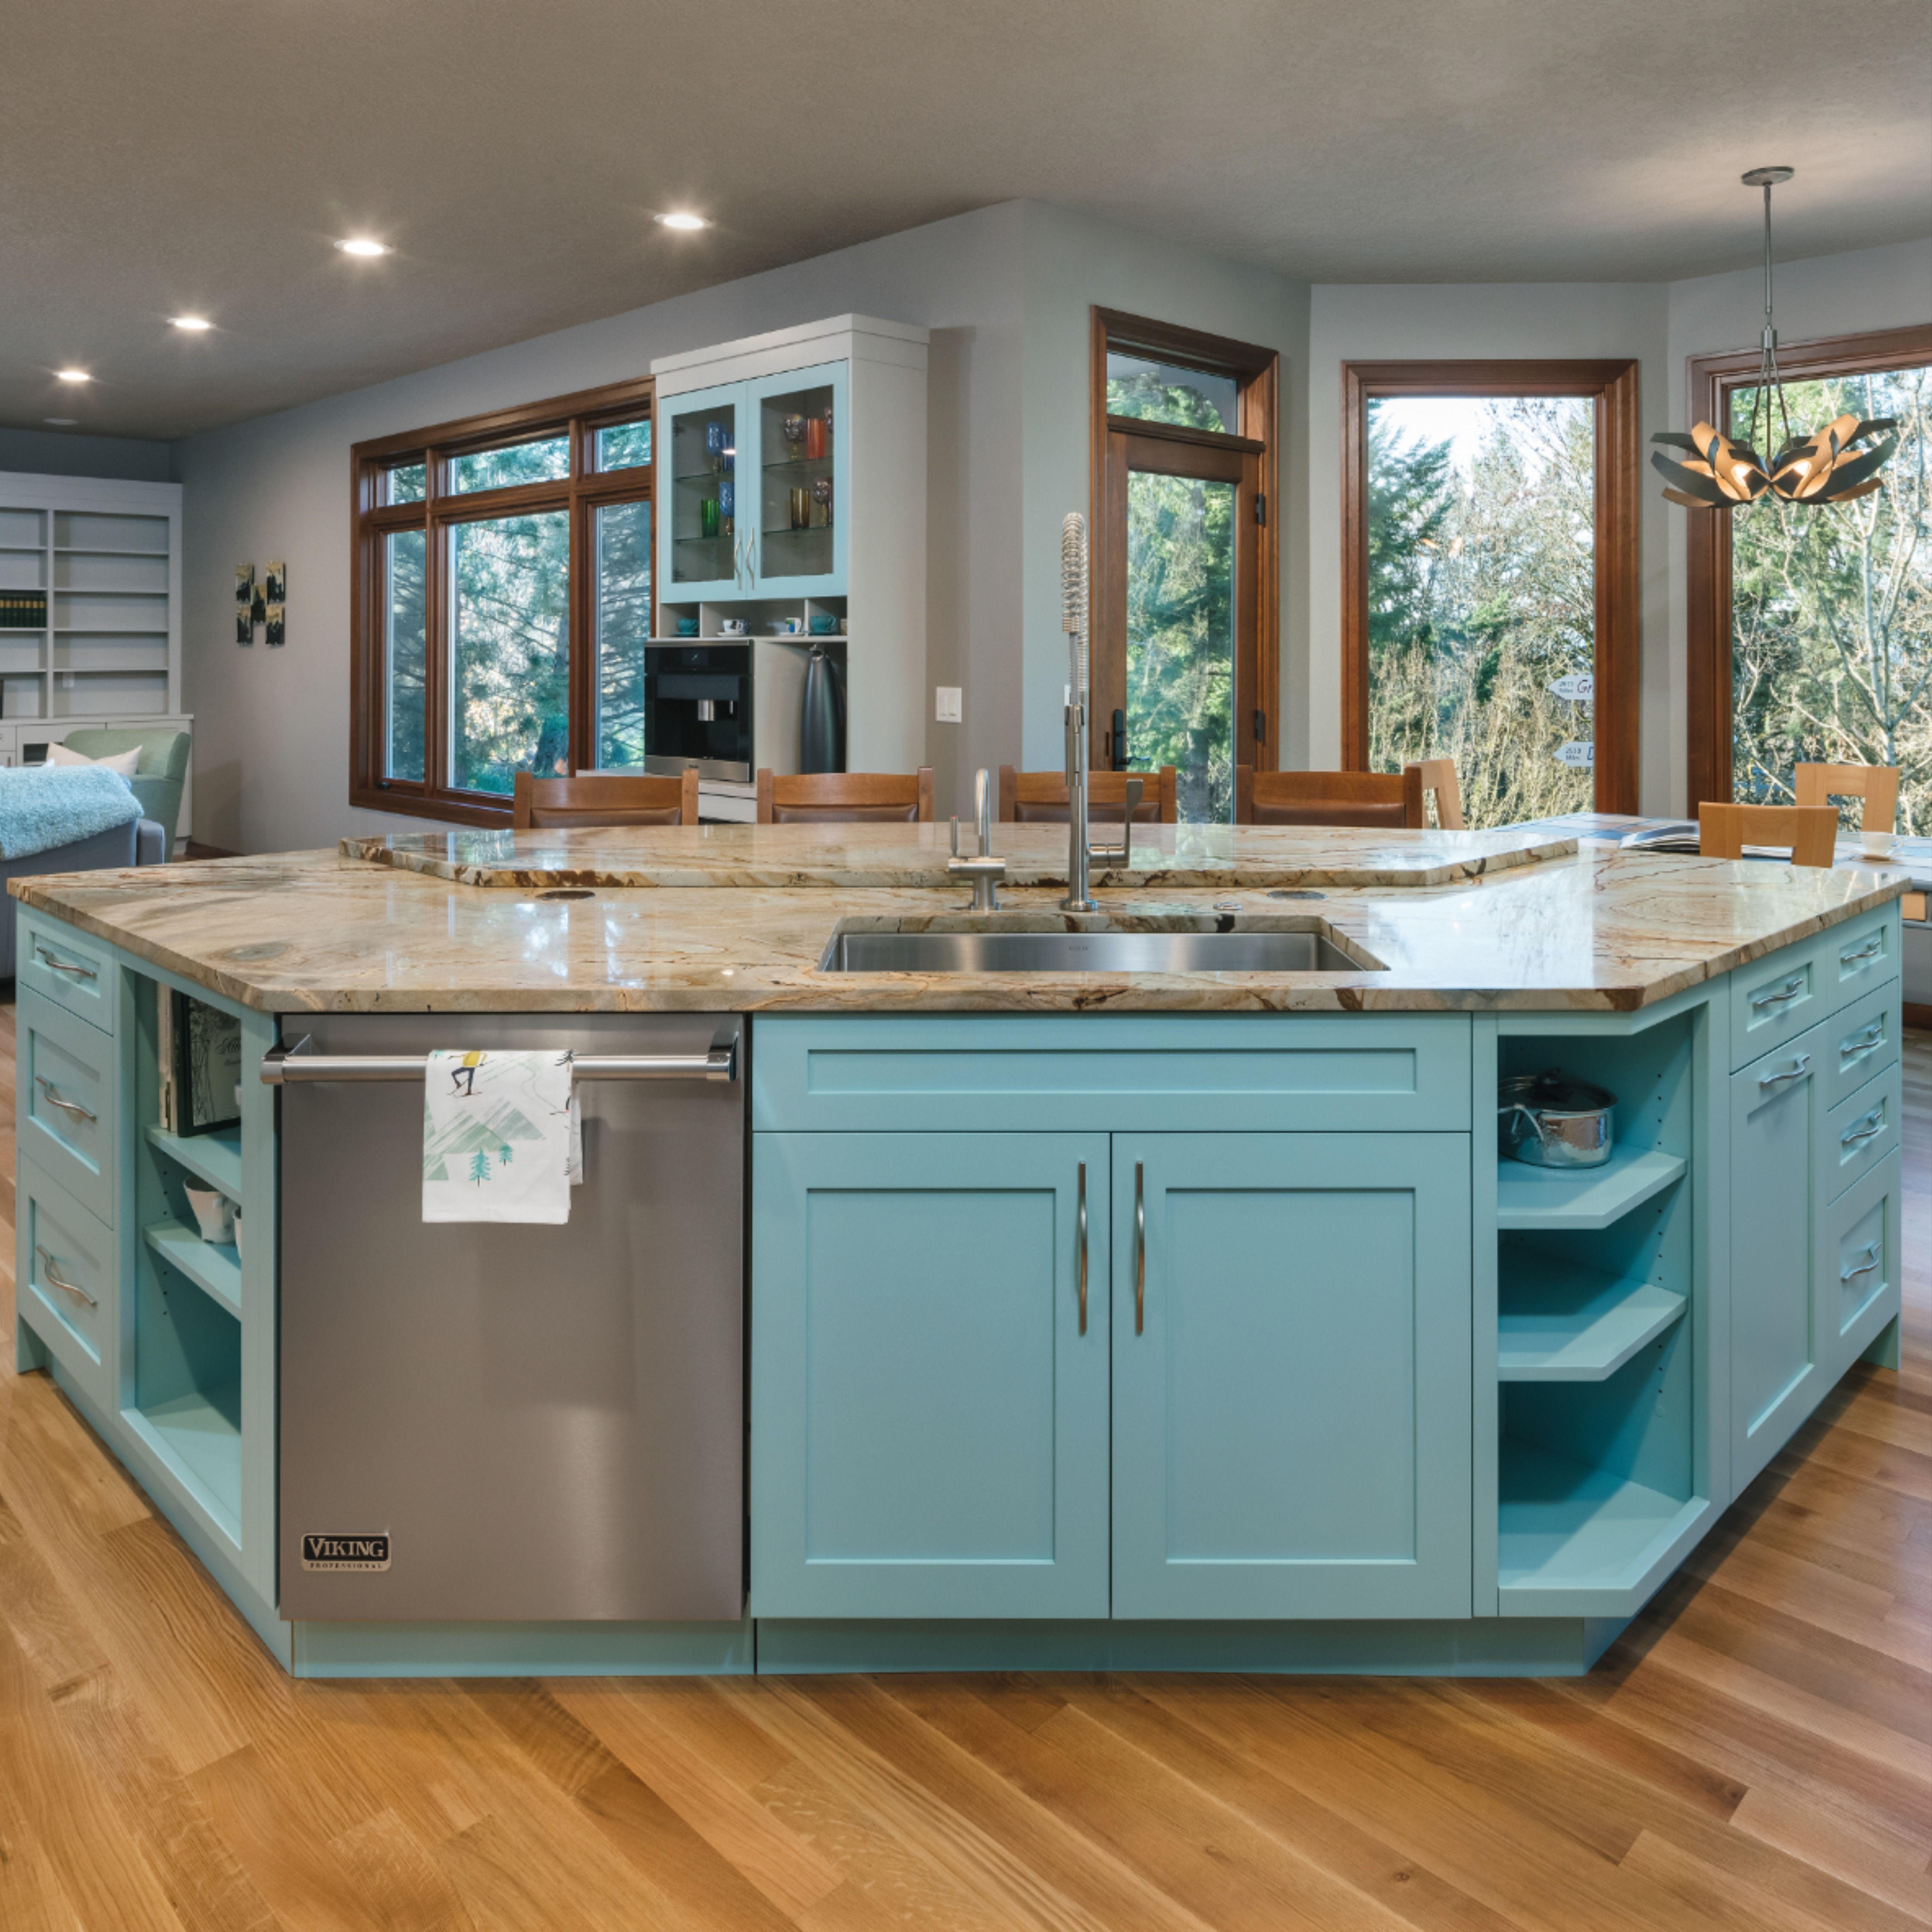 Unique Kitchen Island Shapes Kitchen Island Shapes Open Floor Plan Kitchen Kitchen Decor Items